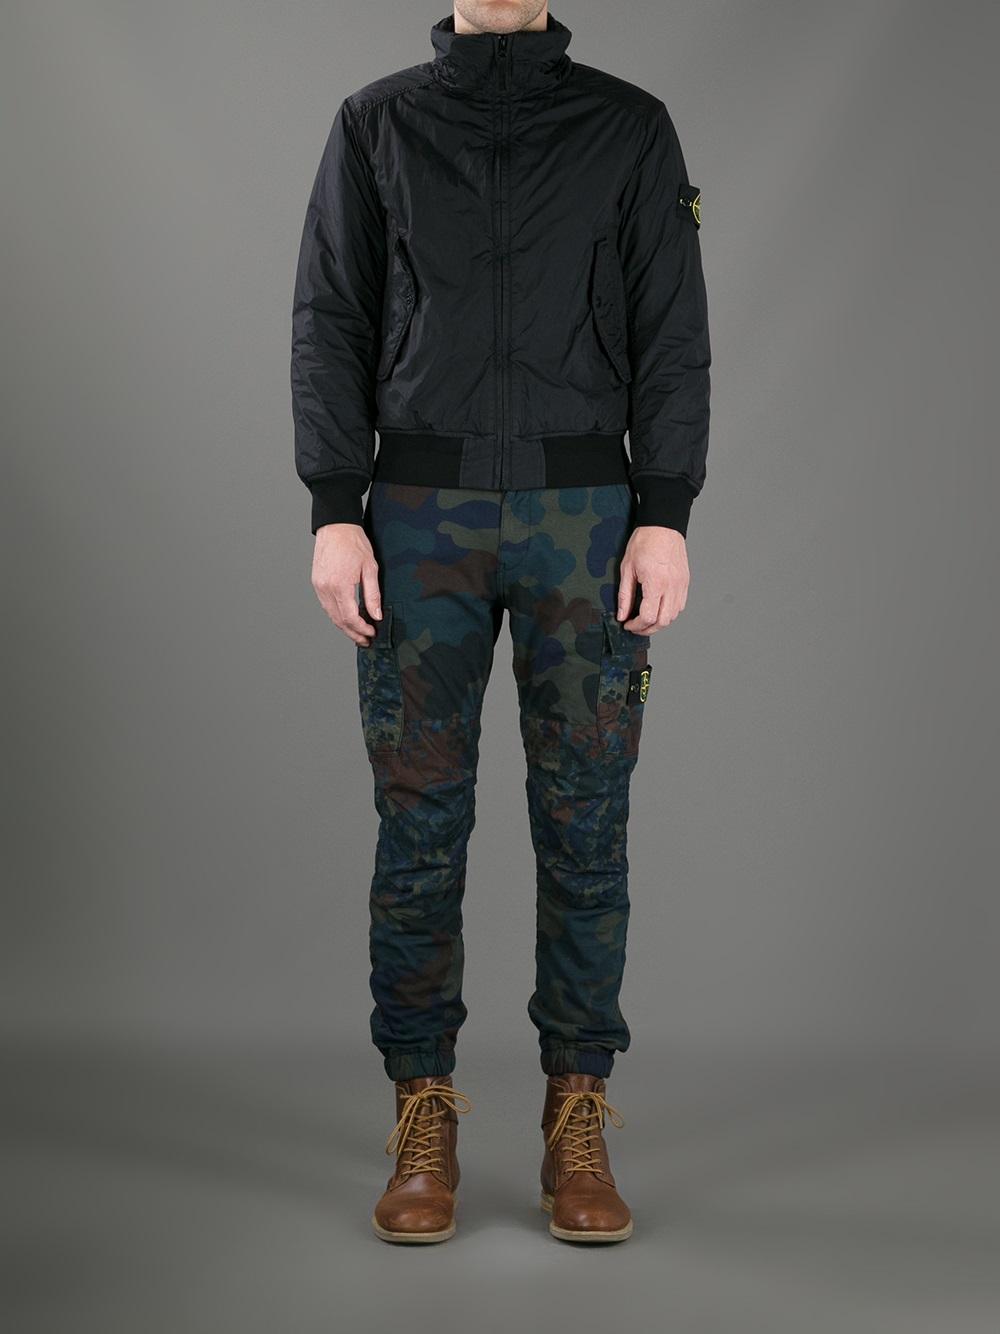 Stone Island Bomber Jacket In Black For Men Lyst